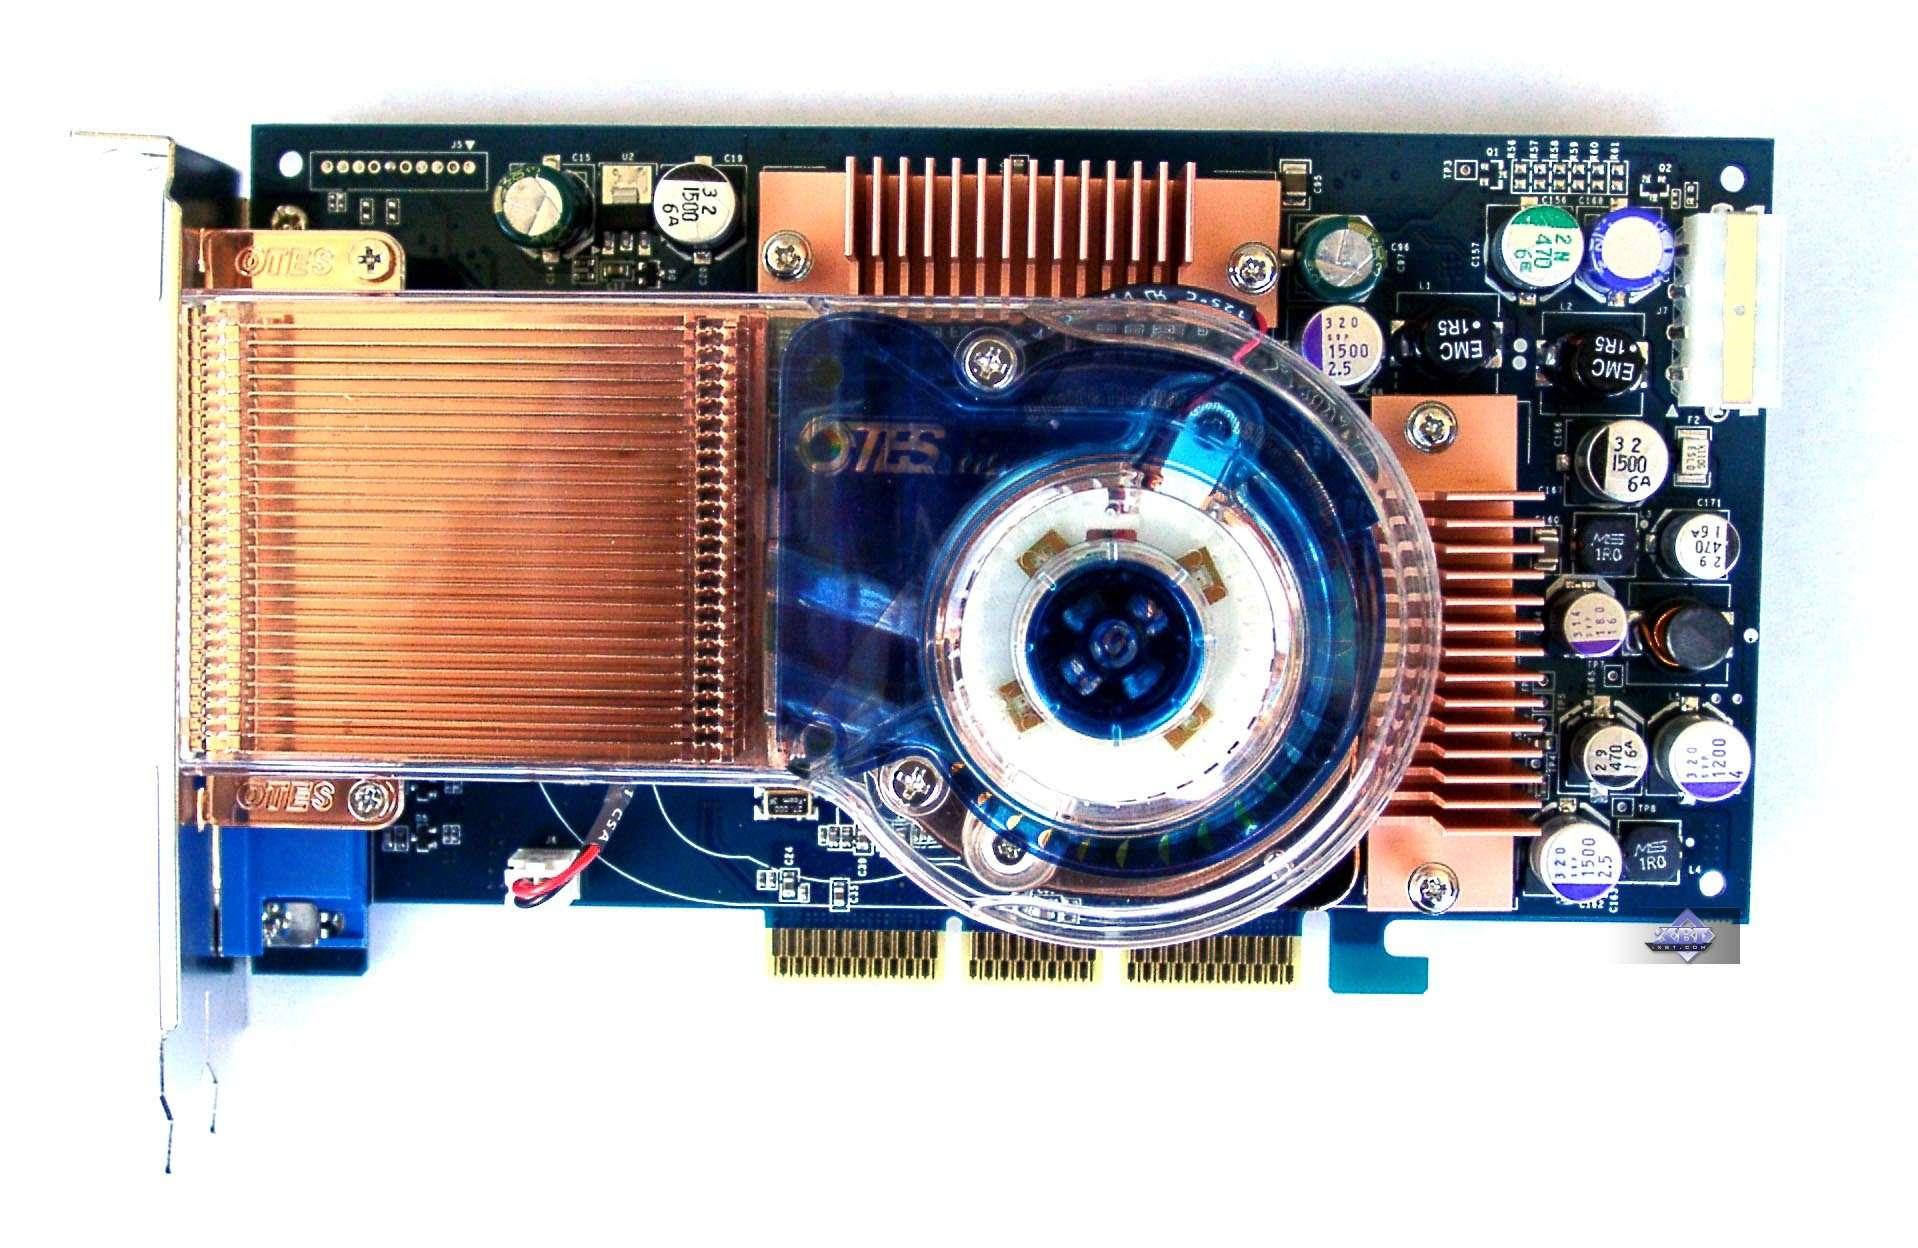 Nvidia geforce fx 5600 ultra rev2 agp 8x 256mb specification.